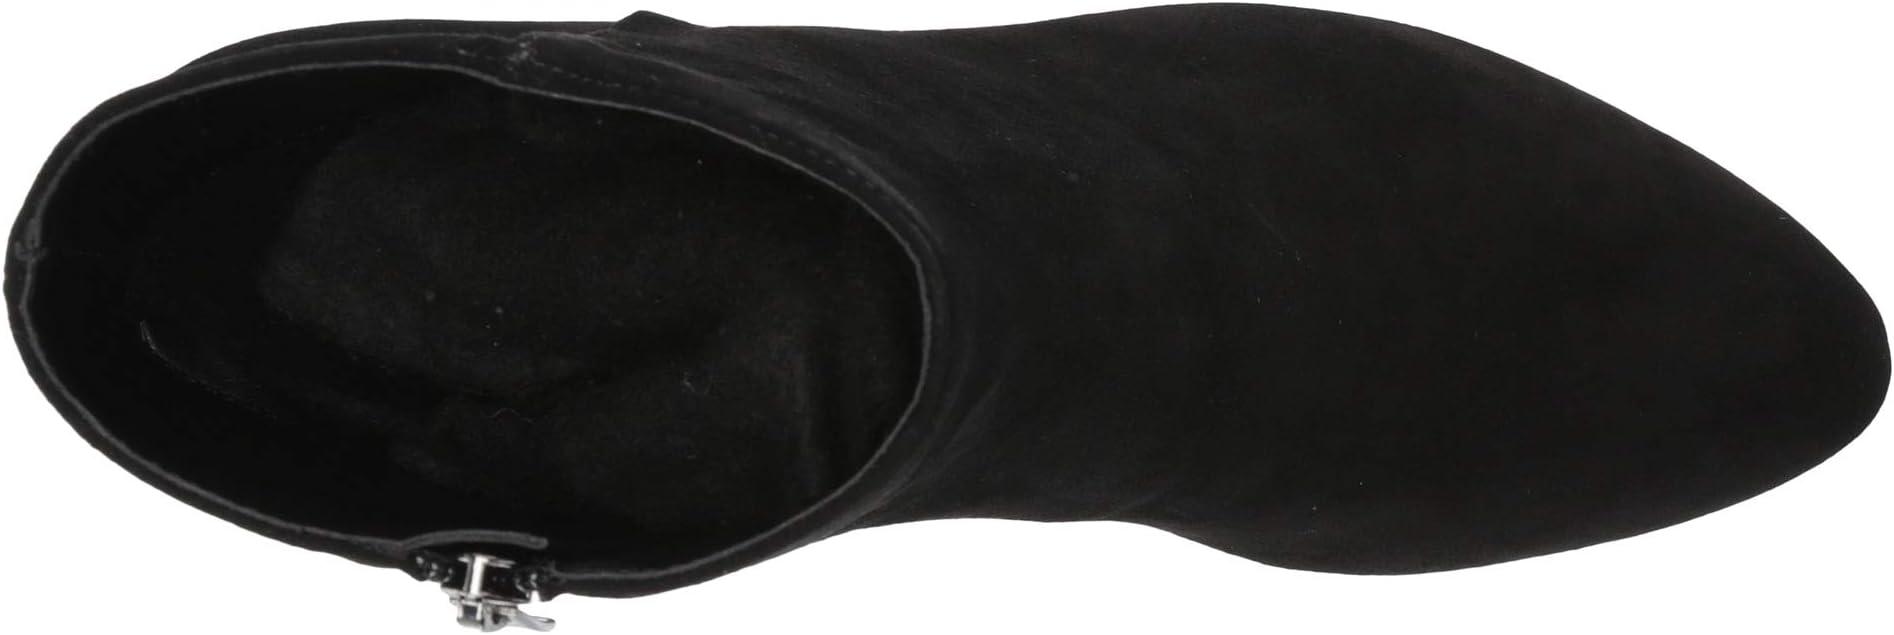 Nine West Trin Bootie | Women's shoes | 2020 Newest